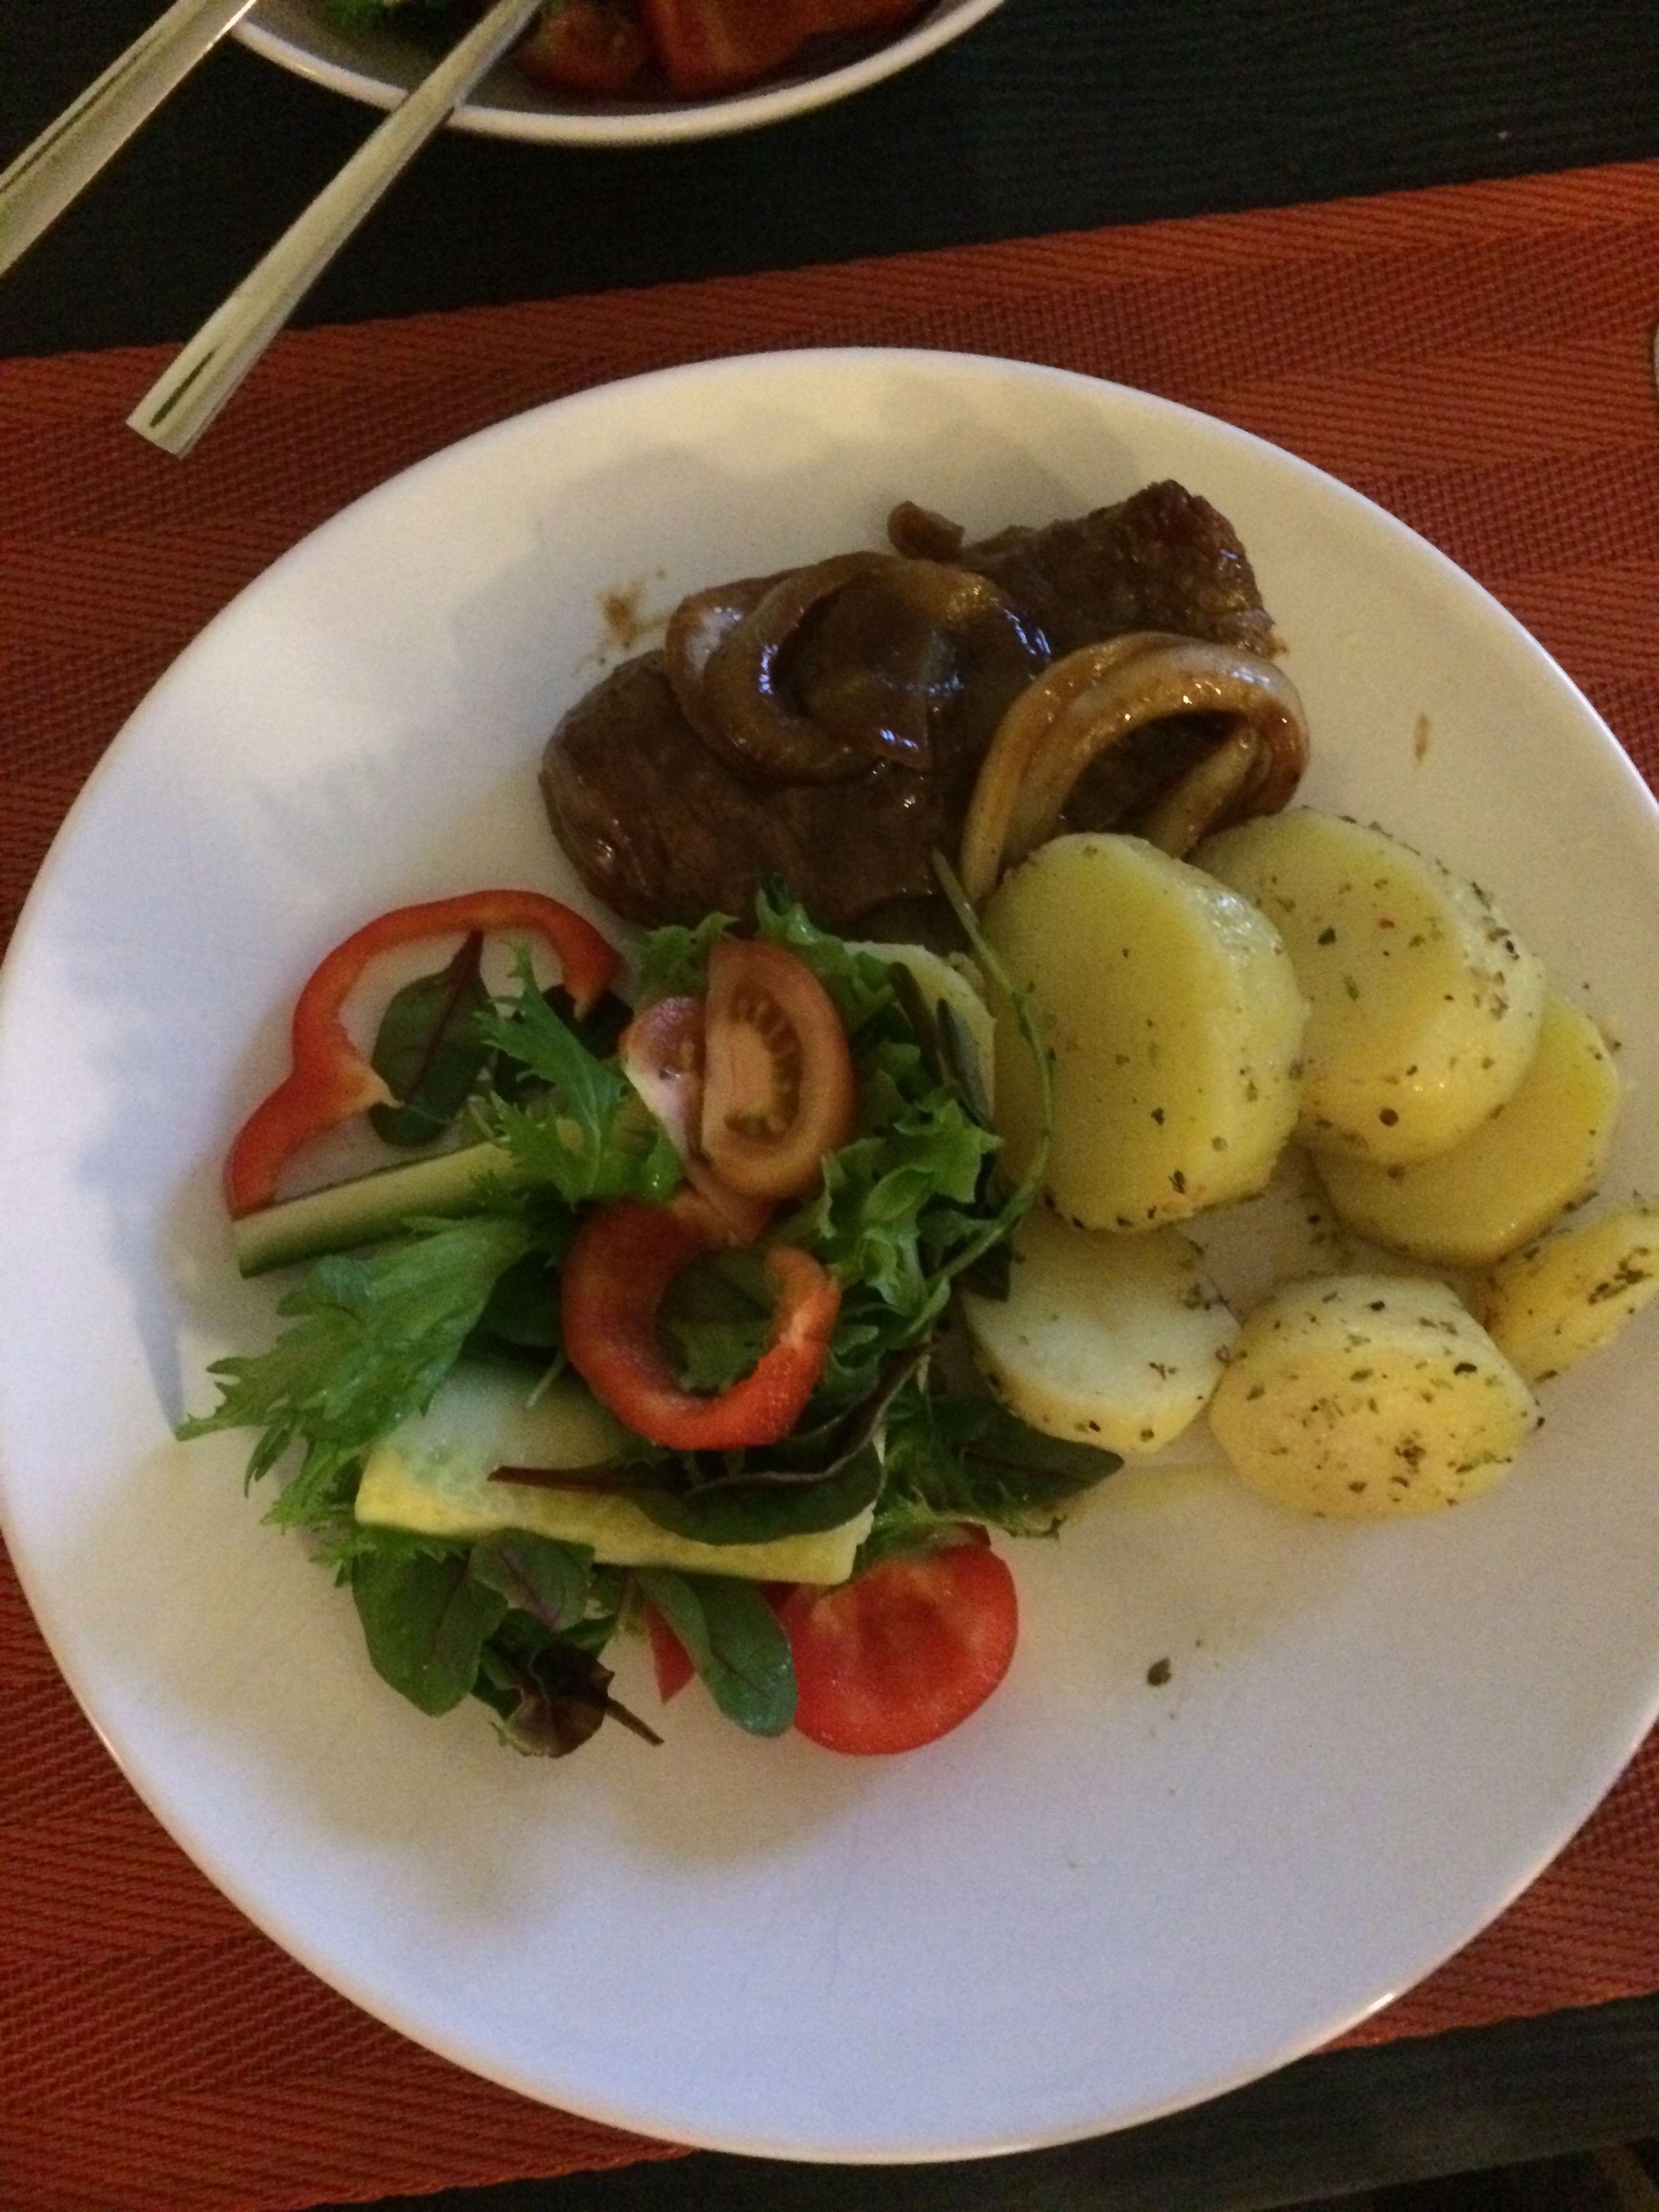 Meat with sautéed potatoes and salad